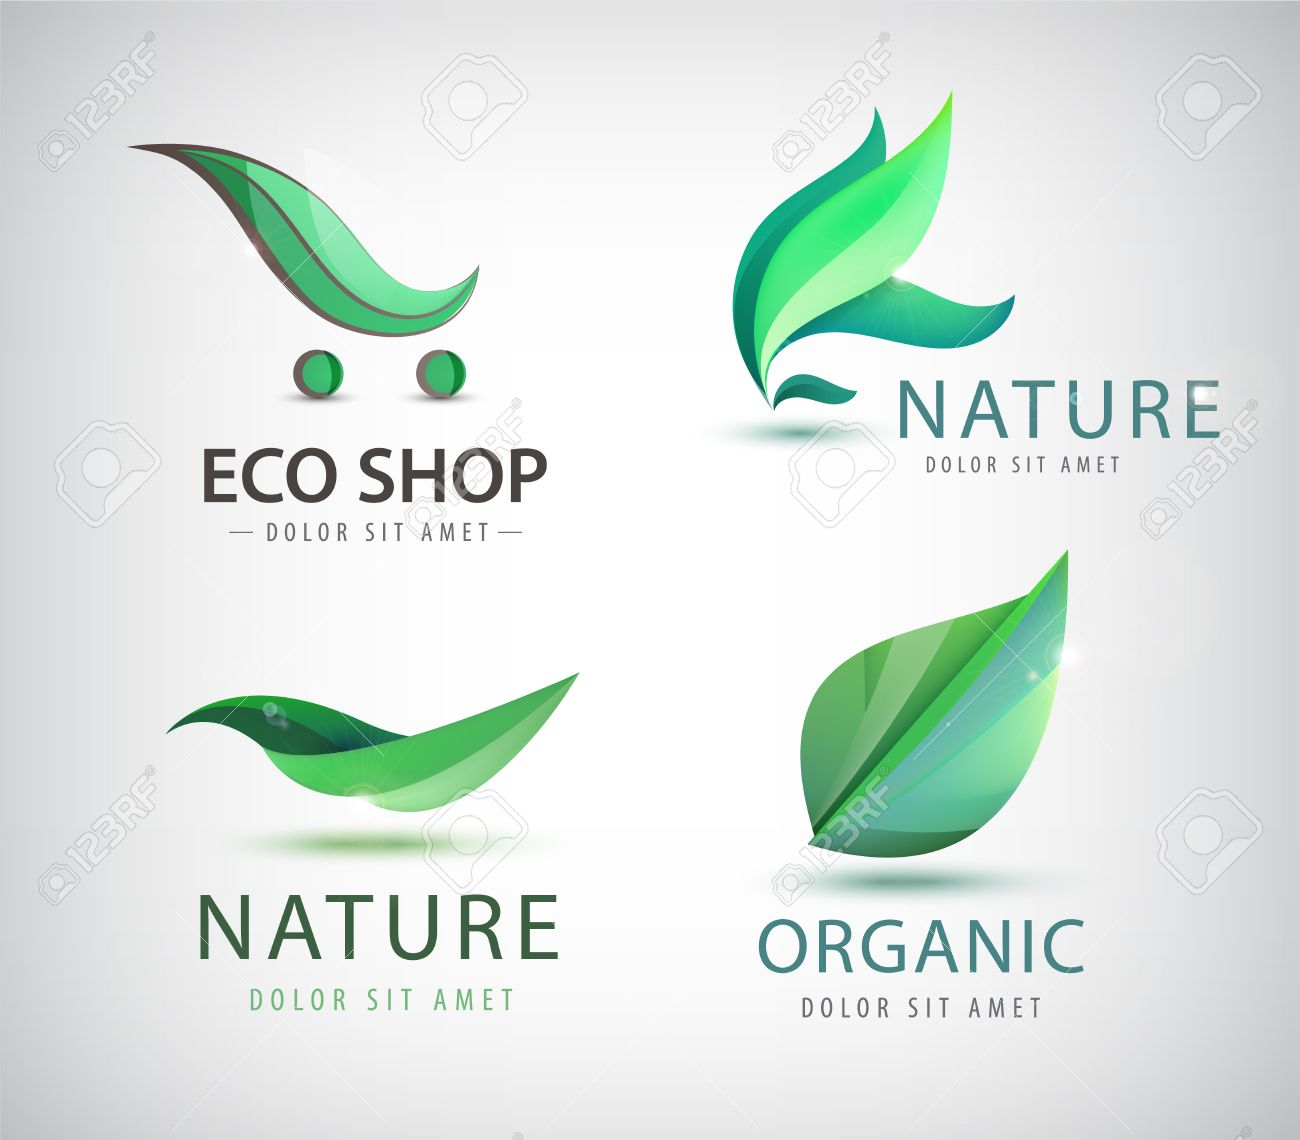 Vector set of eco logos, leaves organic logos, nature logos. Bio energy, organic shop logo icon isolated - 52748174